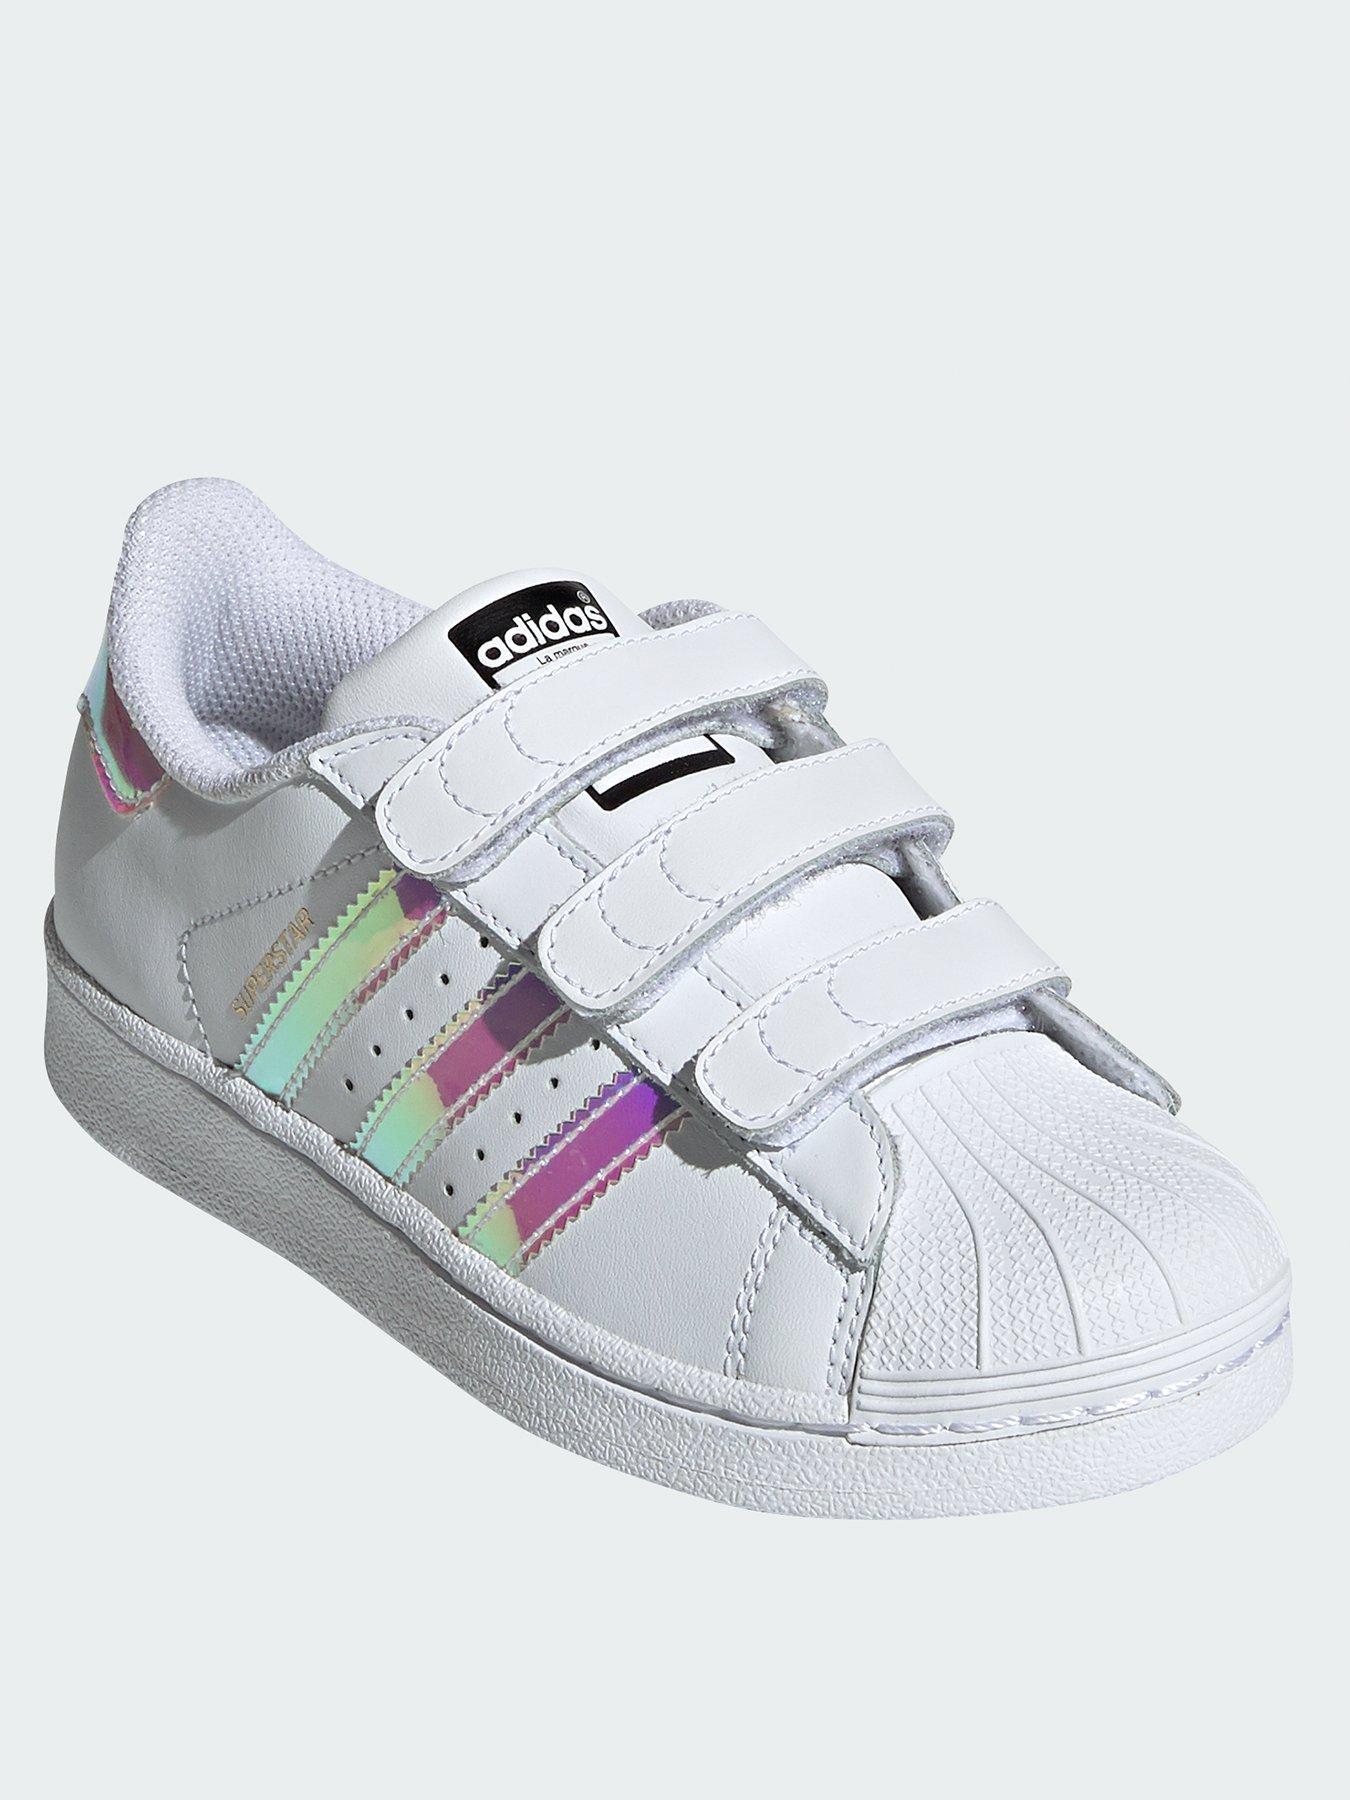 baby adidas pram shoes